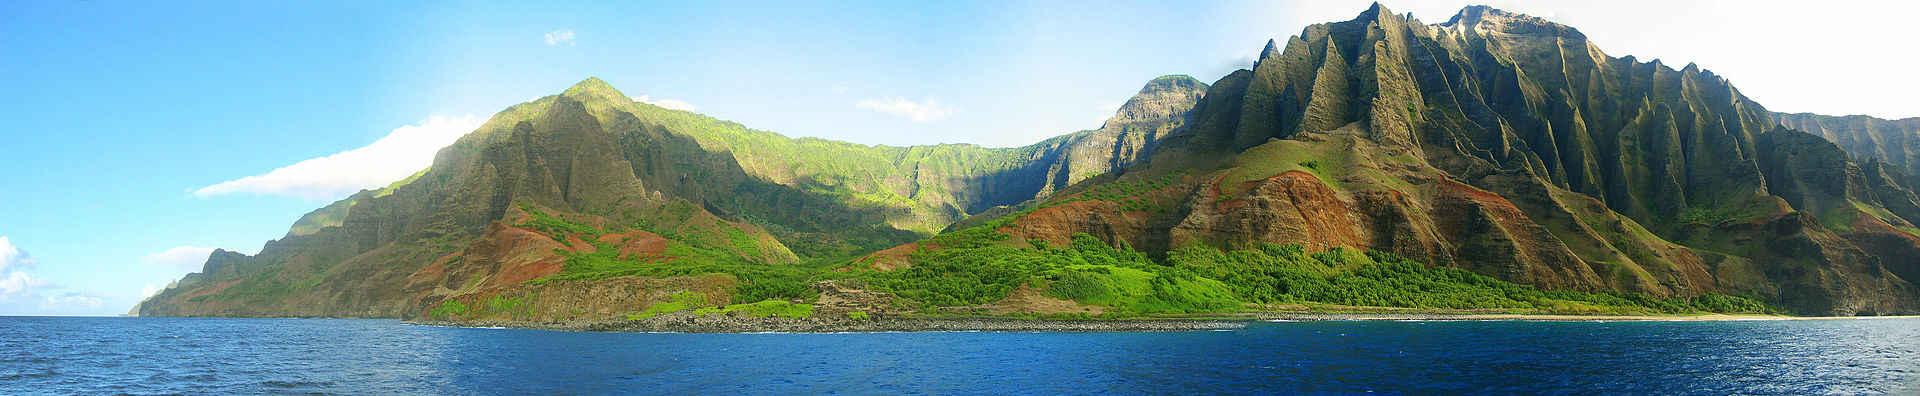 Kauai, Hawaii, United States